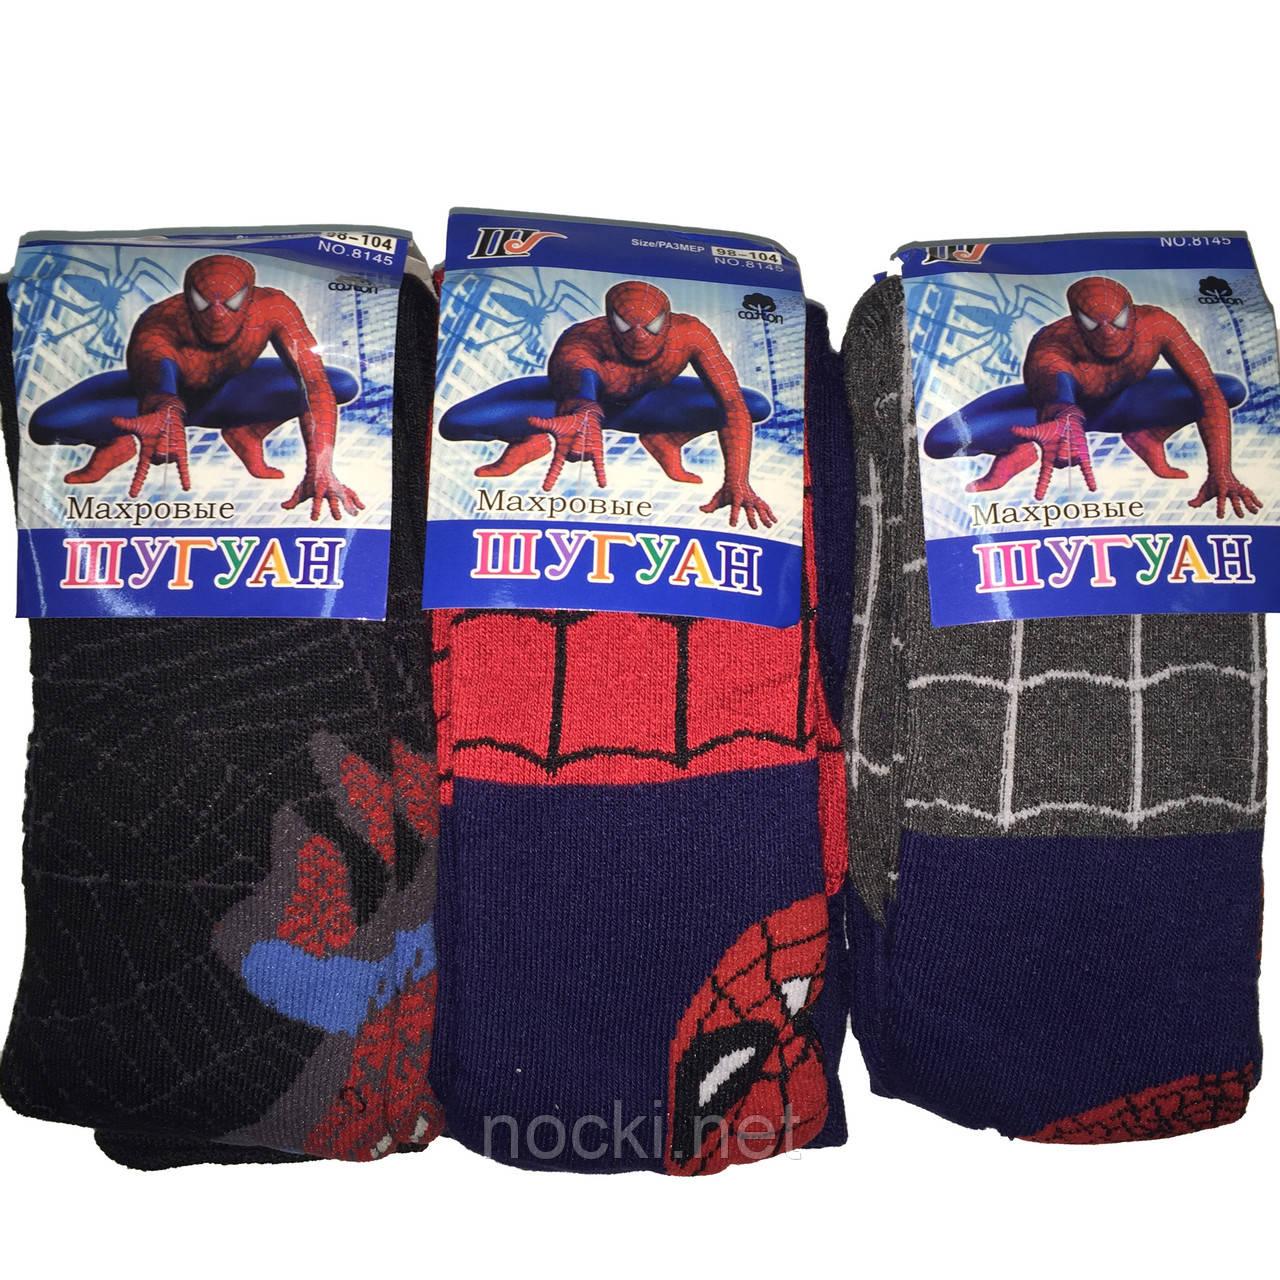 Колготки дитячі махра Шугуан Spider man (Людина-павук) ріст 98-104